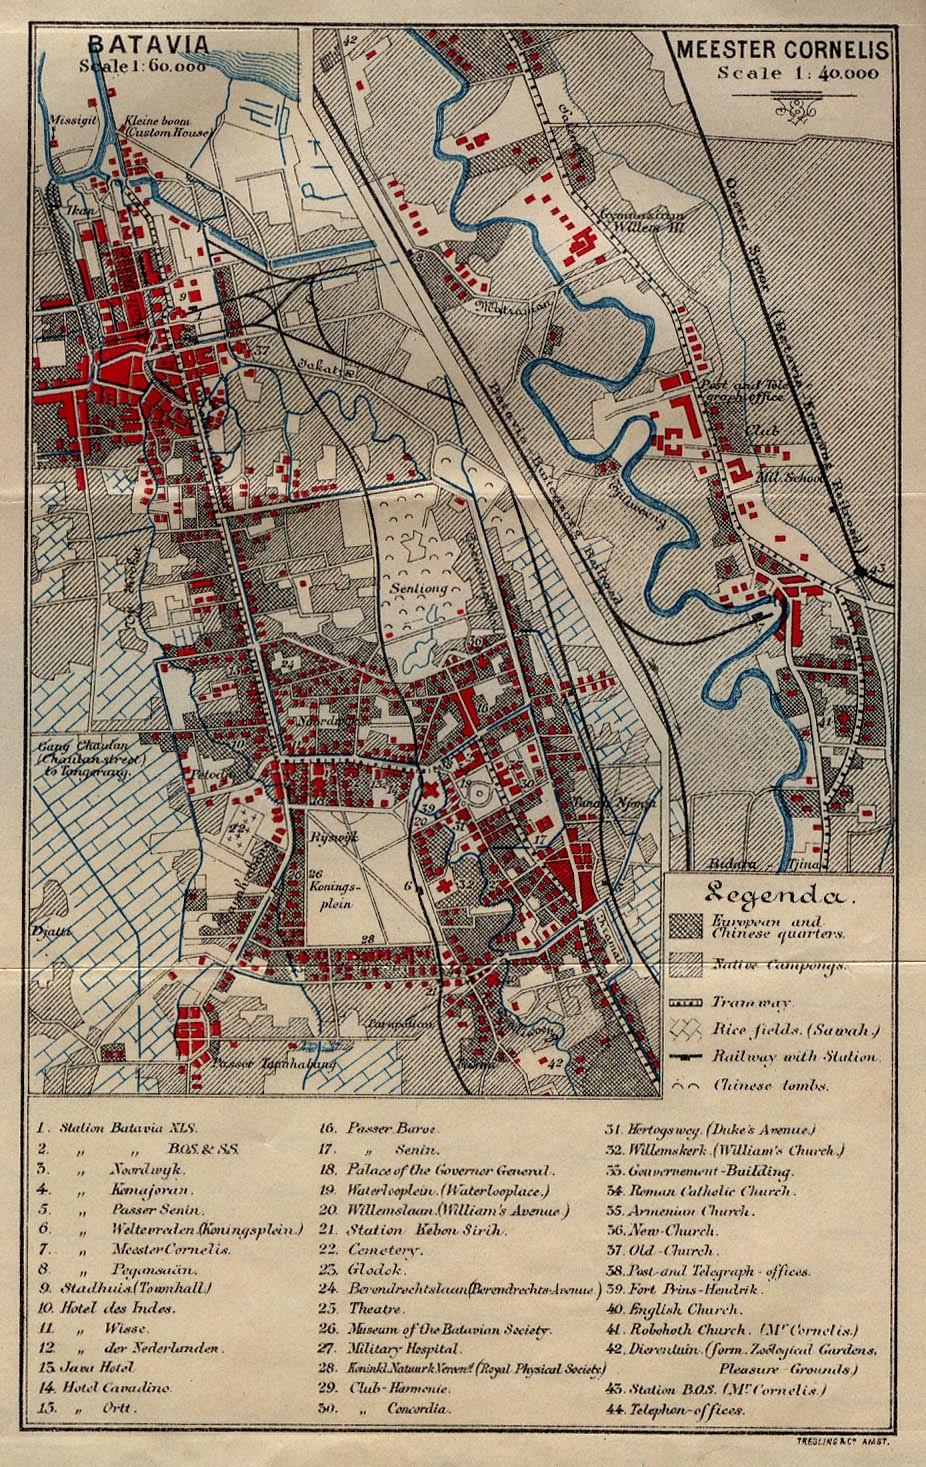 Batavia 1897